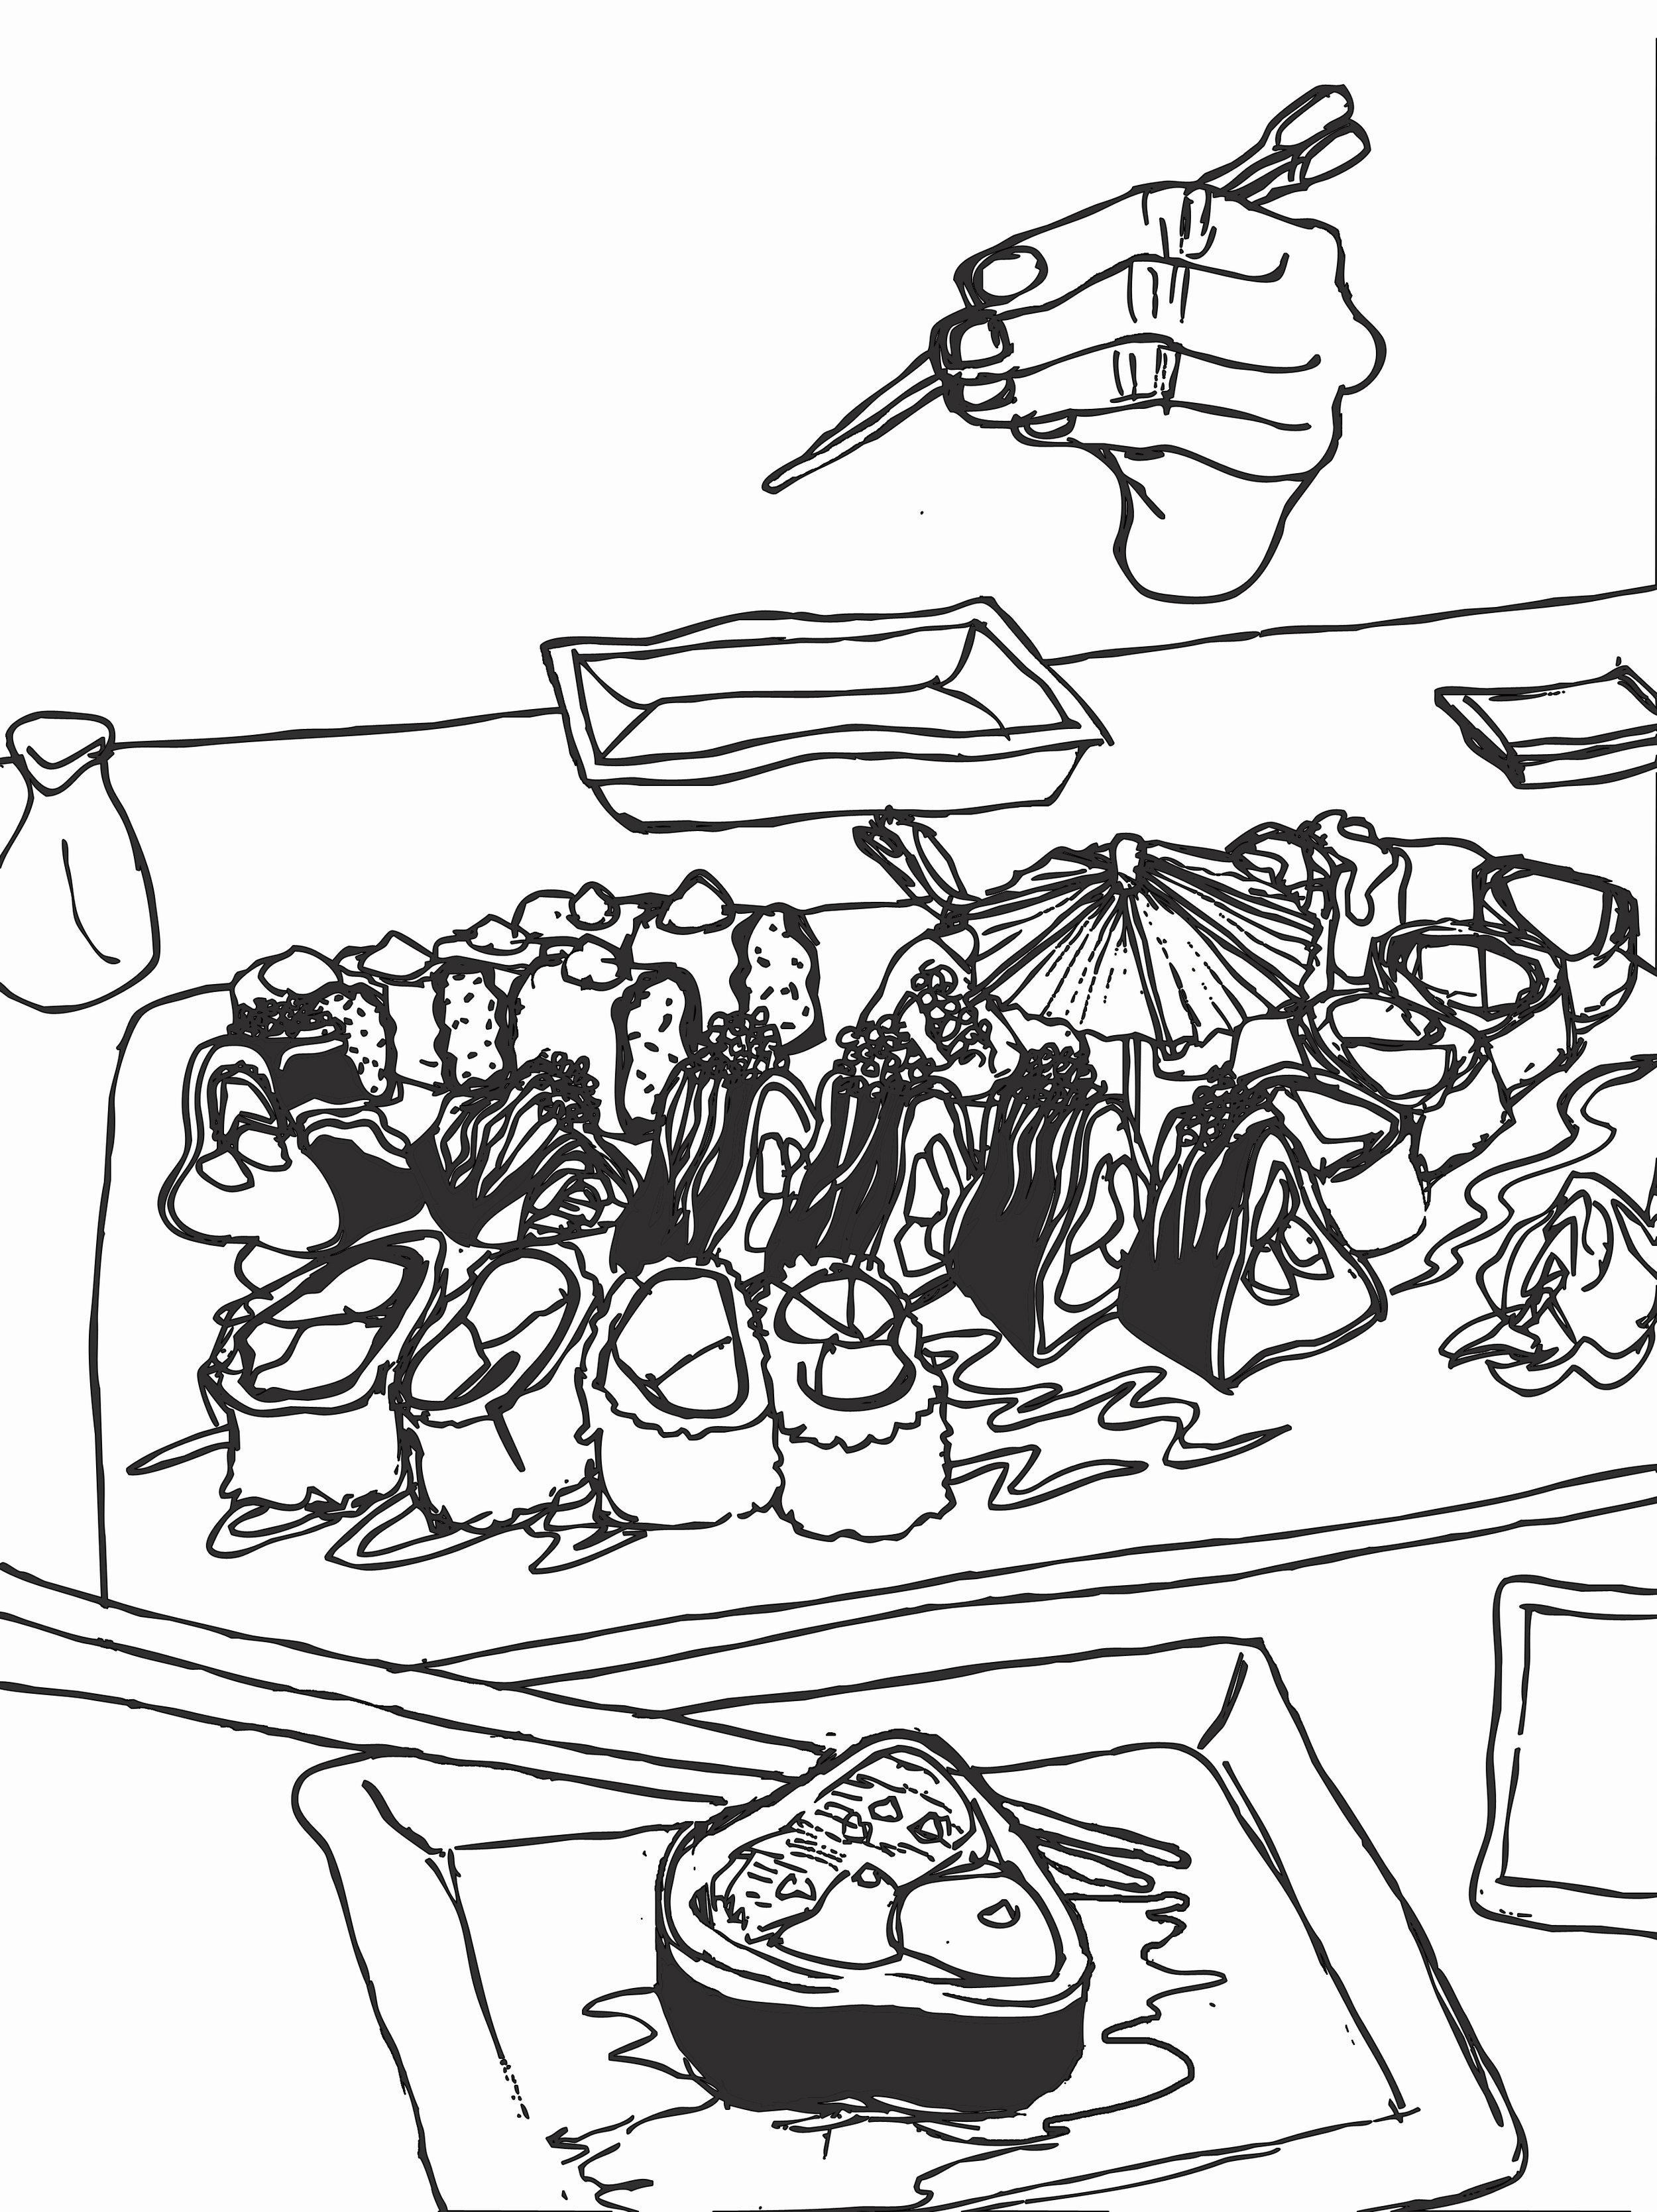 sushifloatinghand.jpg